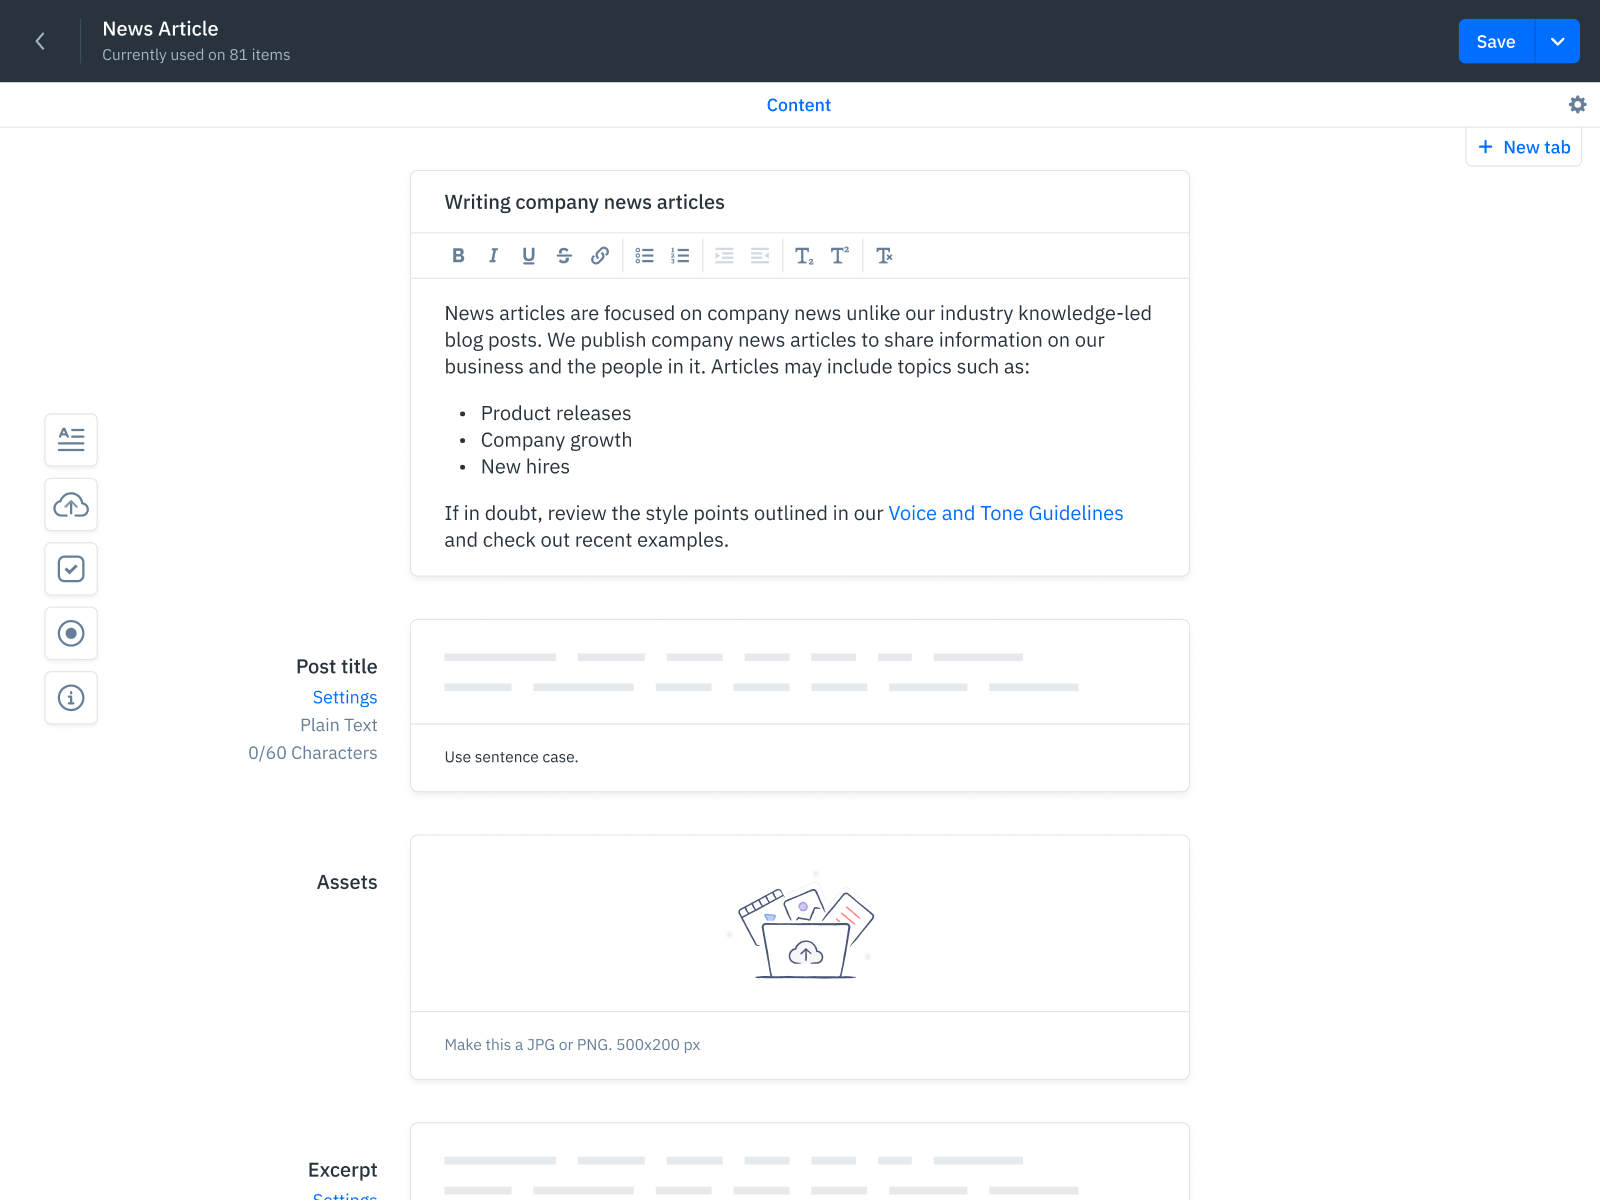 GatherContent Content Workflow UI